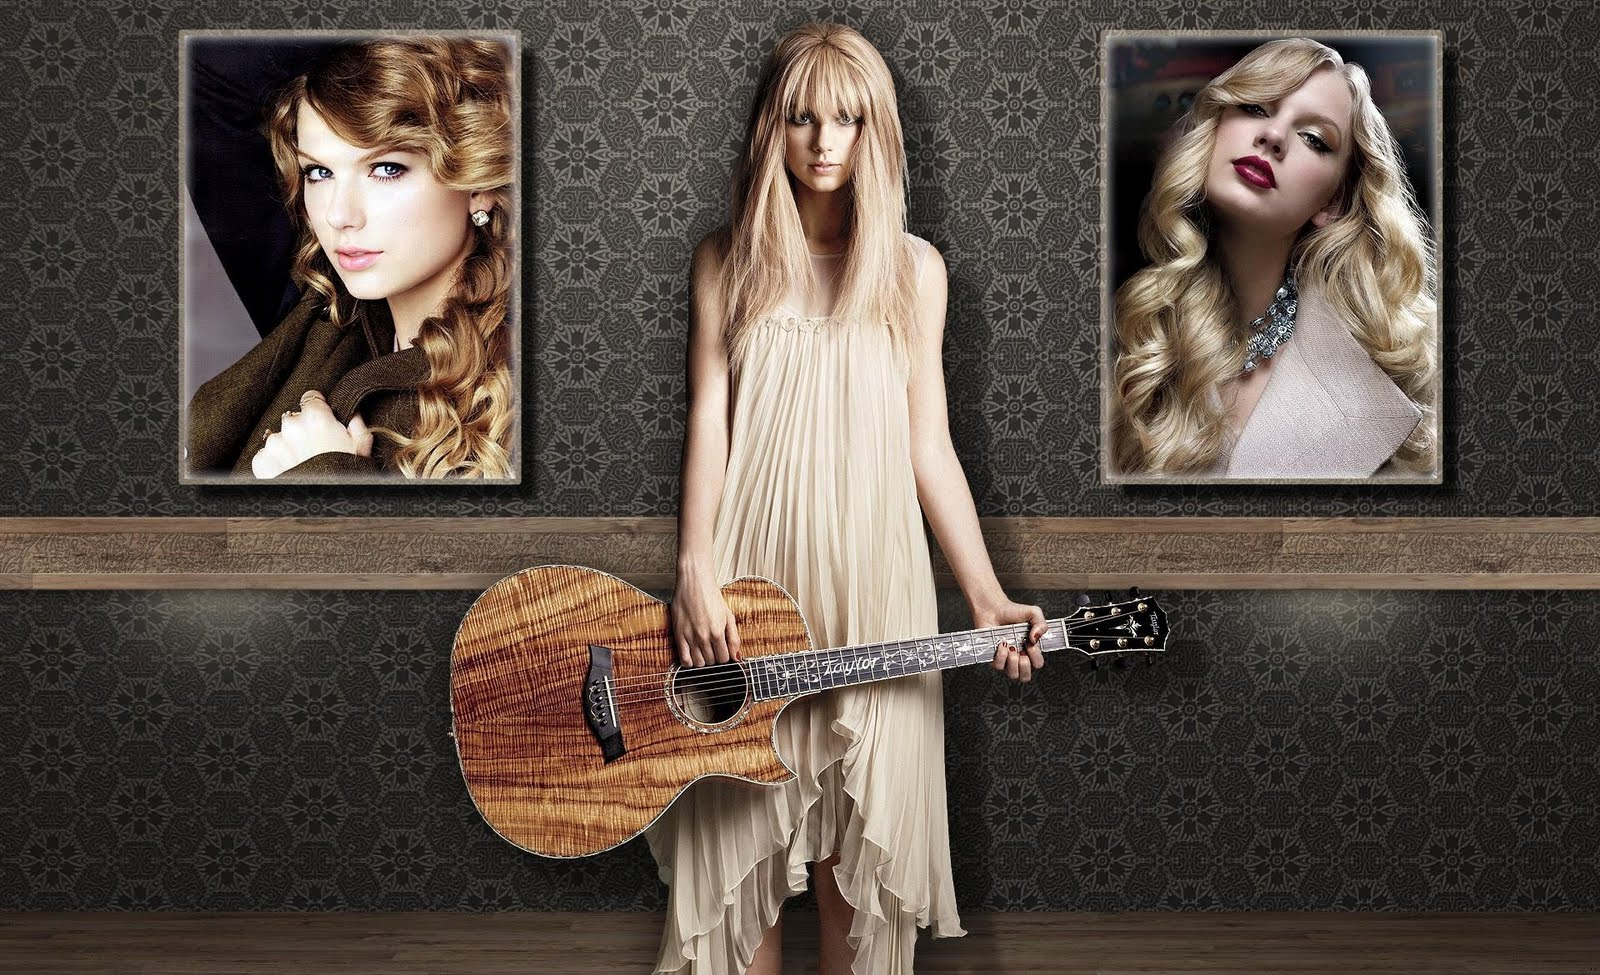 http://2.bp.blogspot.com/-mfYP6eEC3U0/TwmlzHlCqDI/AAAAAAAANCE/_P-tz5Zzz_Y/s1600/Taylor_Swift_hq_wallpapers.jpg